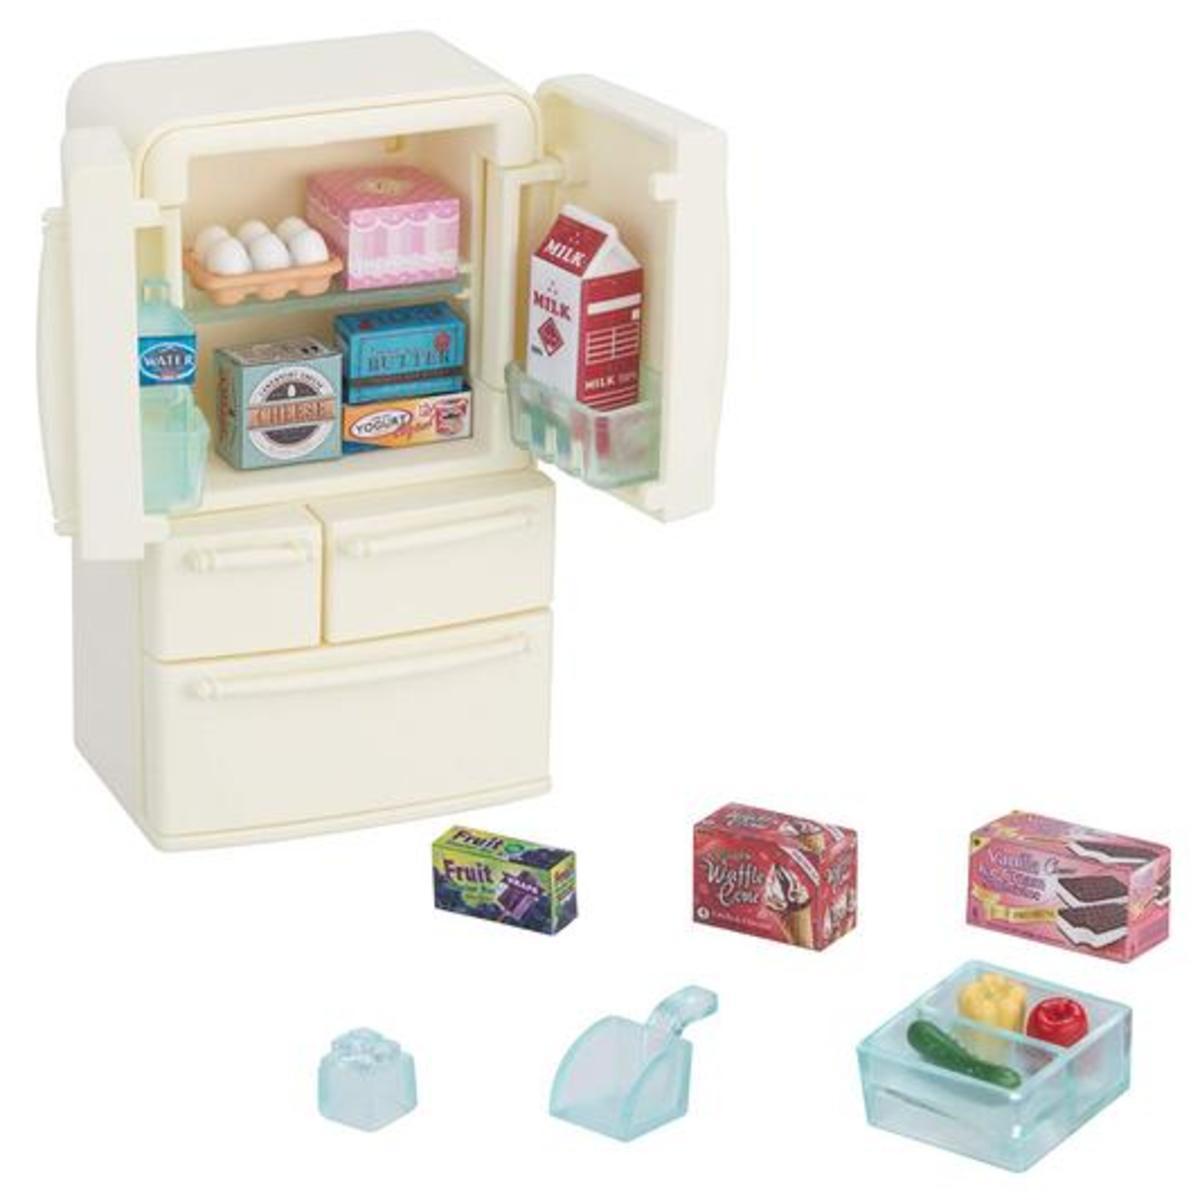 28800- Refrigerator Set